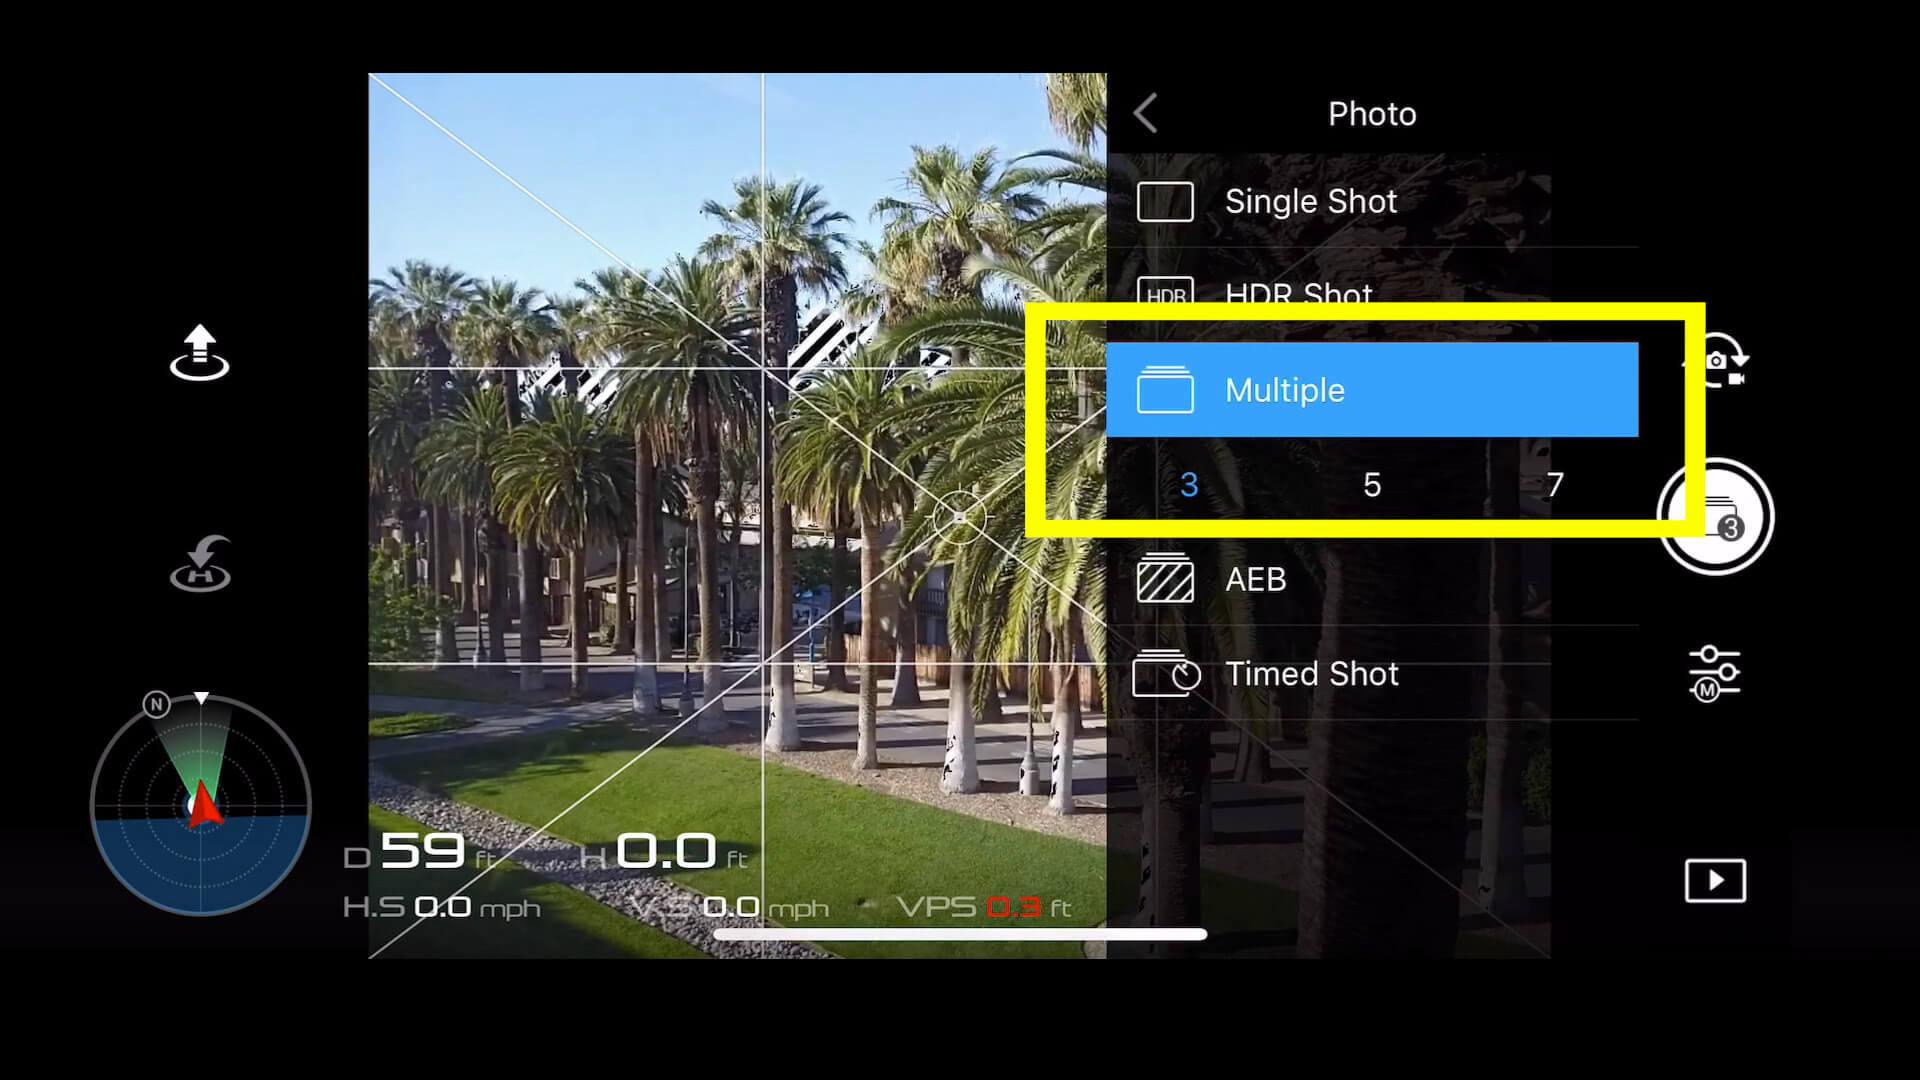 19 basic camera settings for dji drone photos - multiple